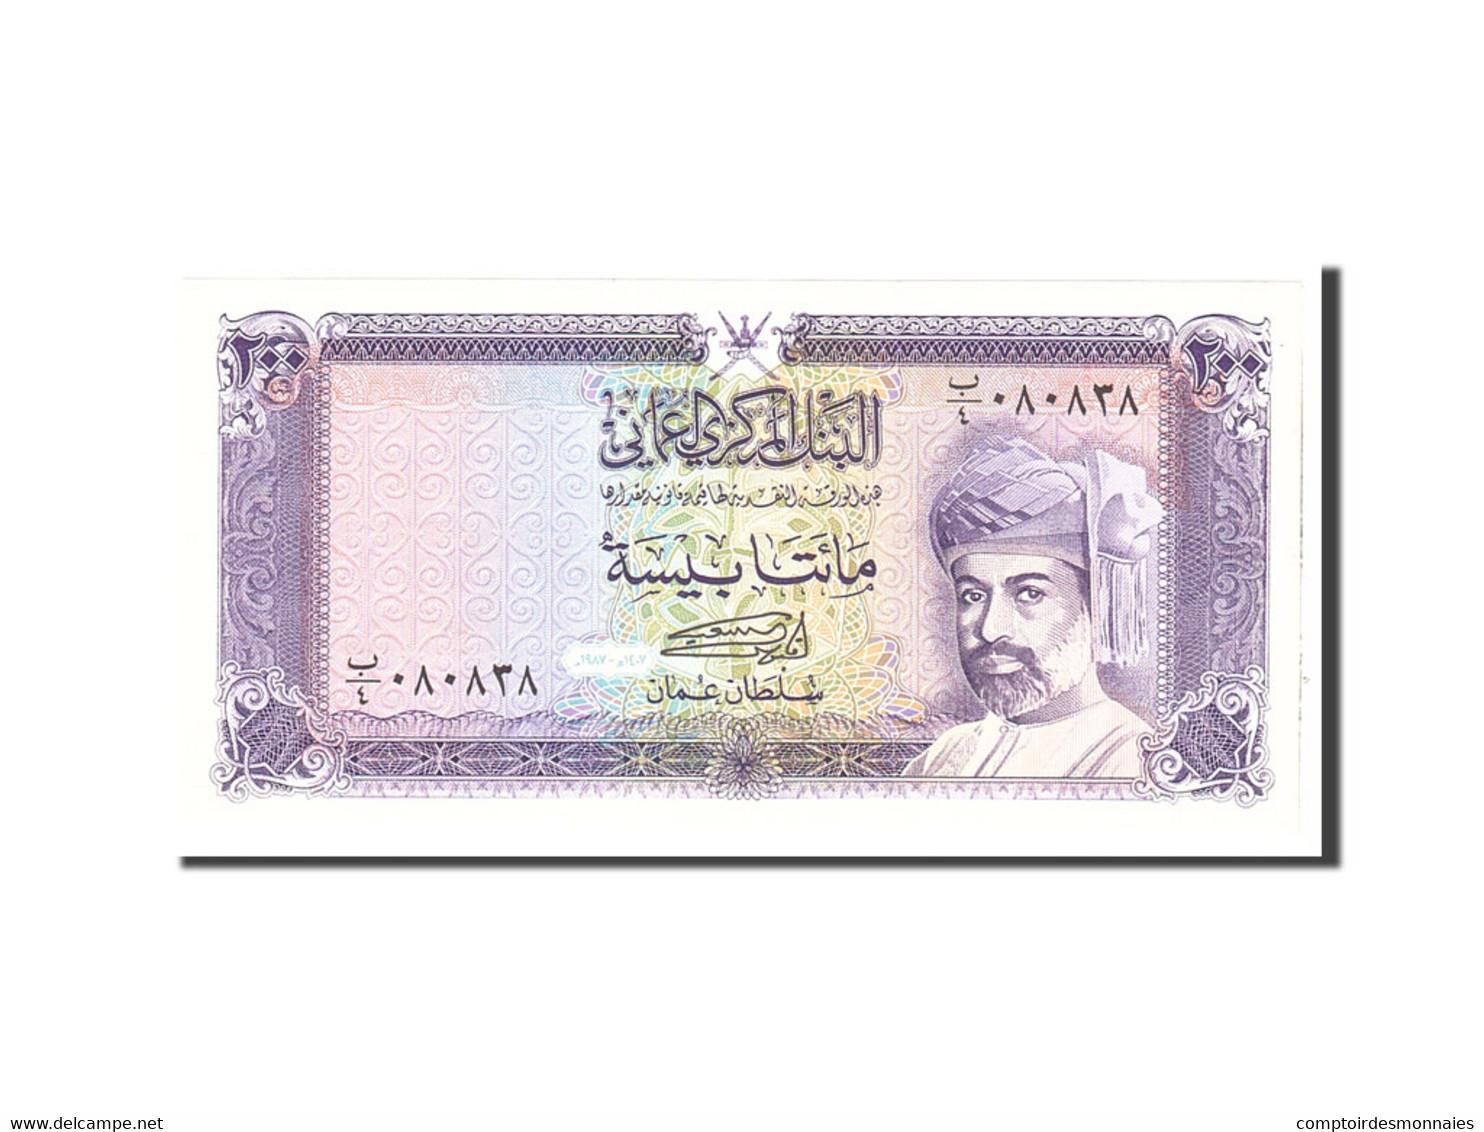 Oman, 200 Baisa, 1987, KM:23a, Undated, SPL - Oman